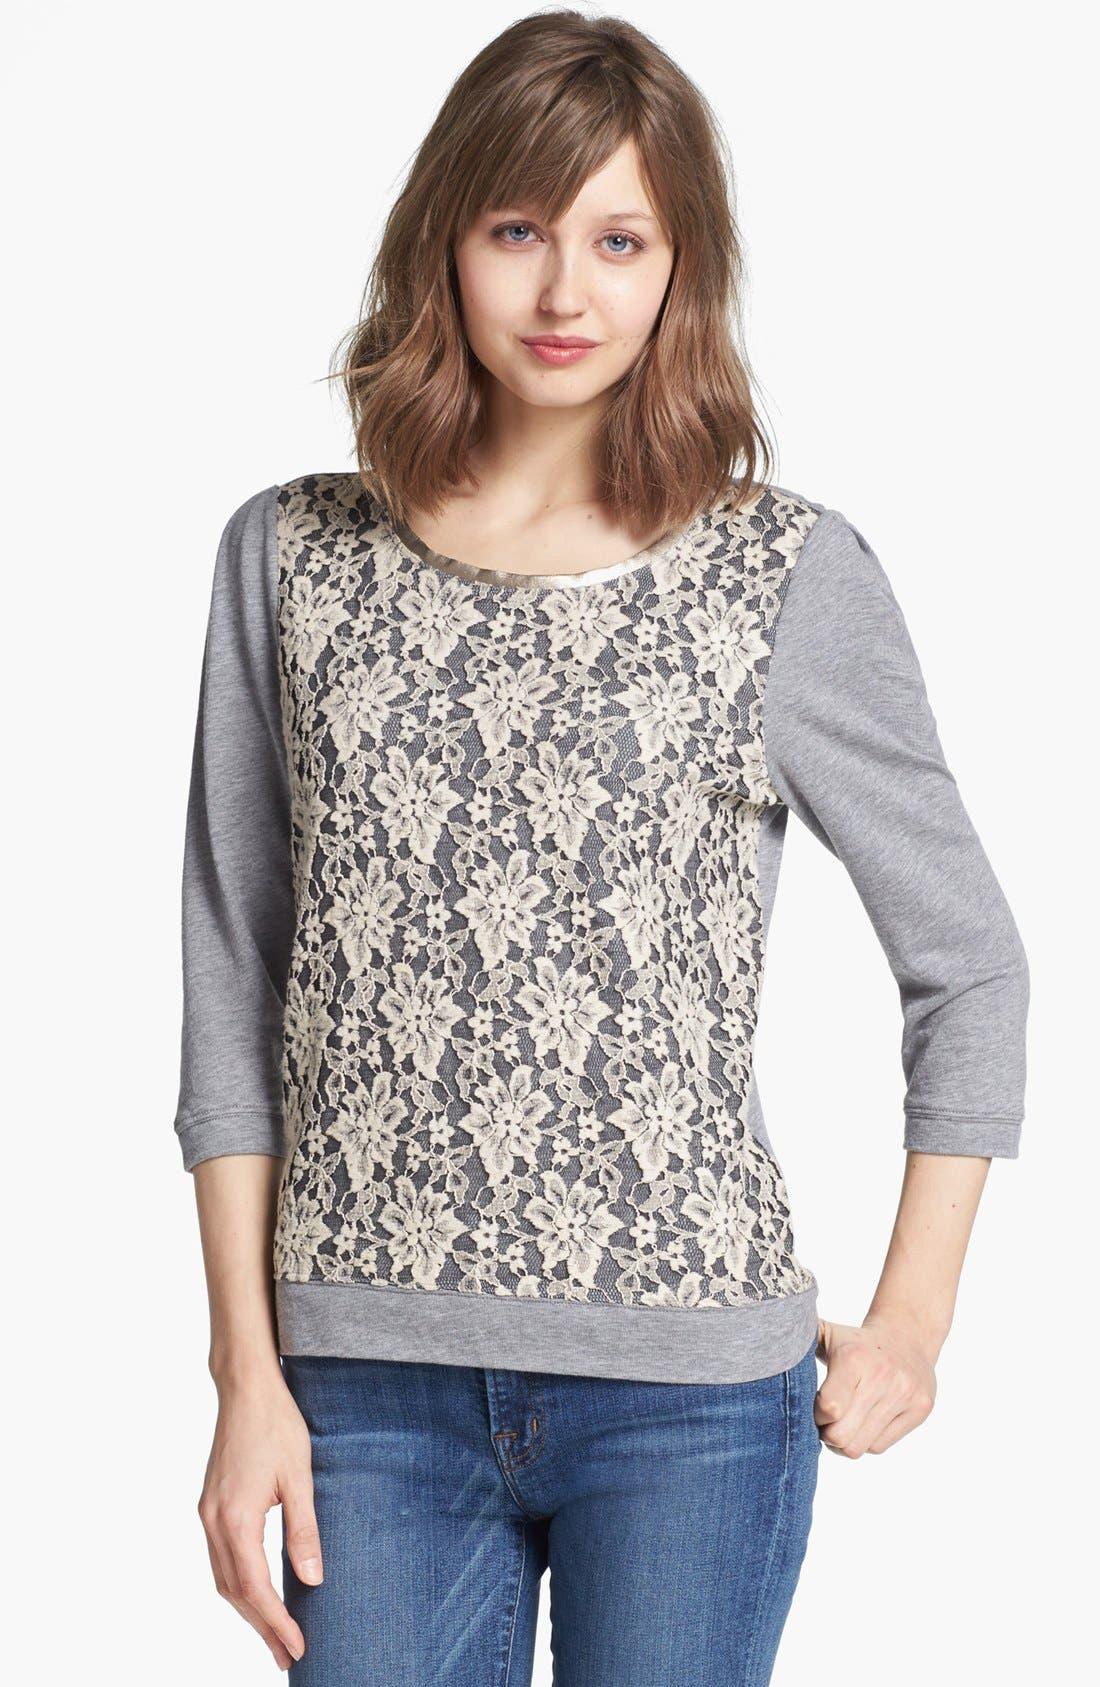 Alternate Image 1 Selected - Hinge® Lace Overlay Sweatshirt